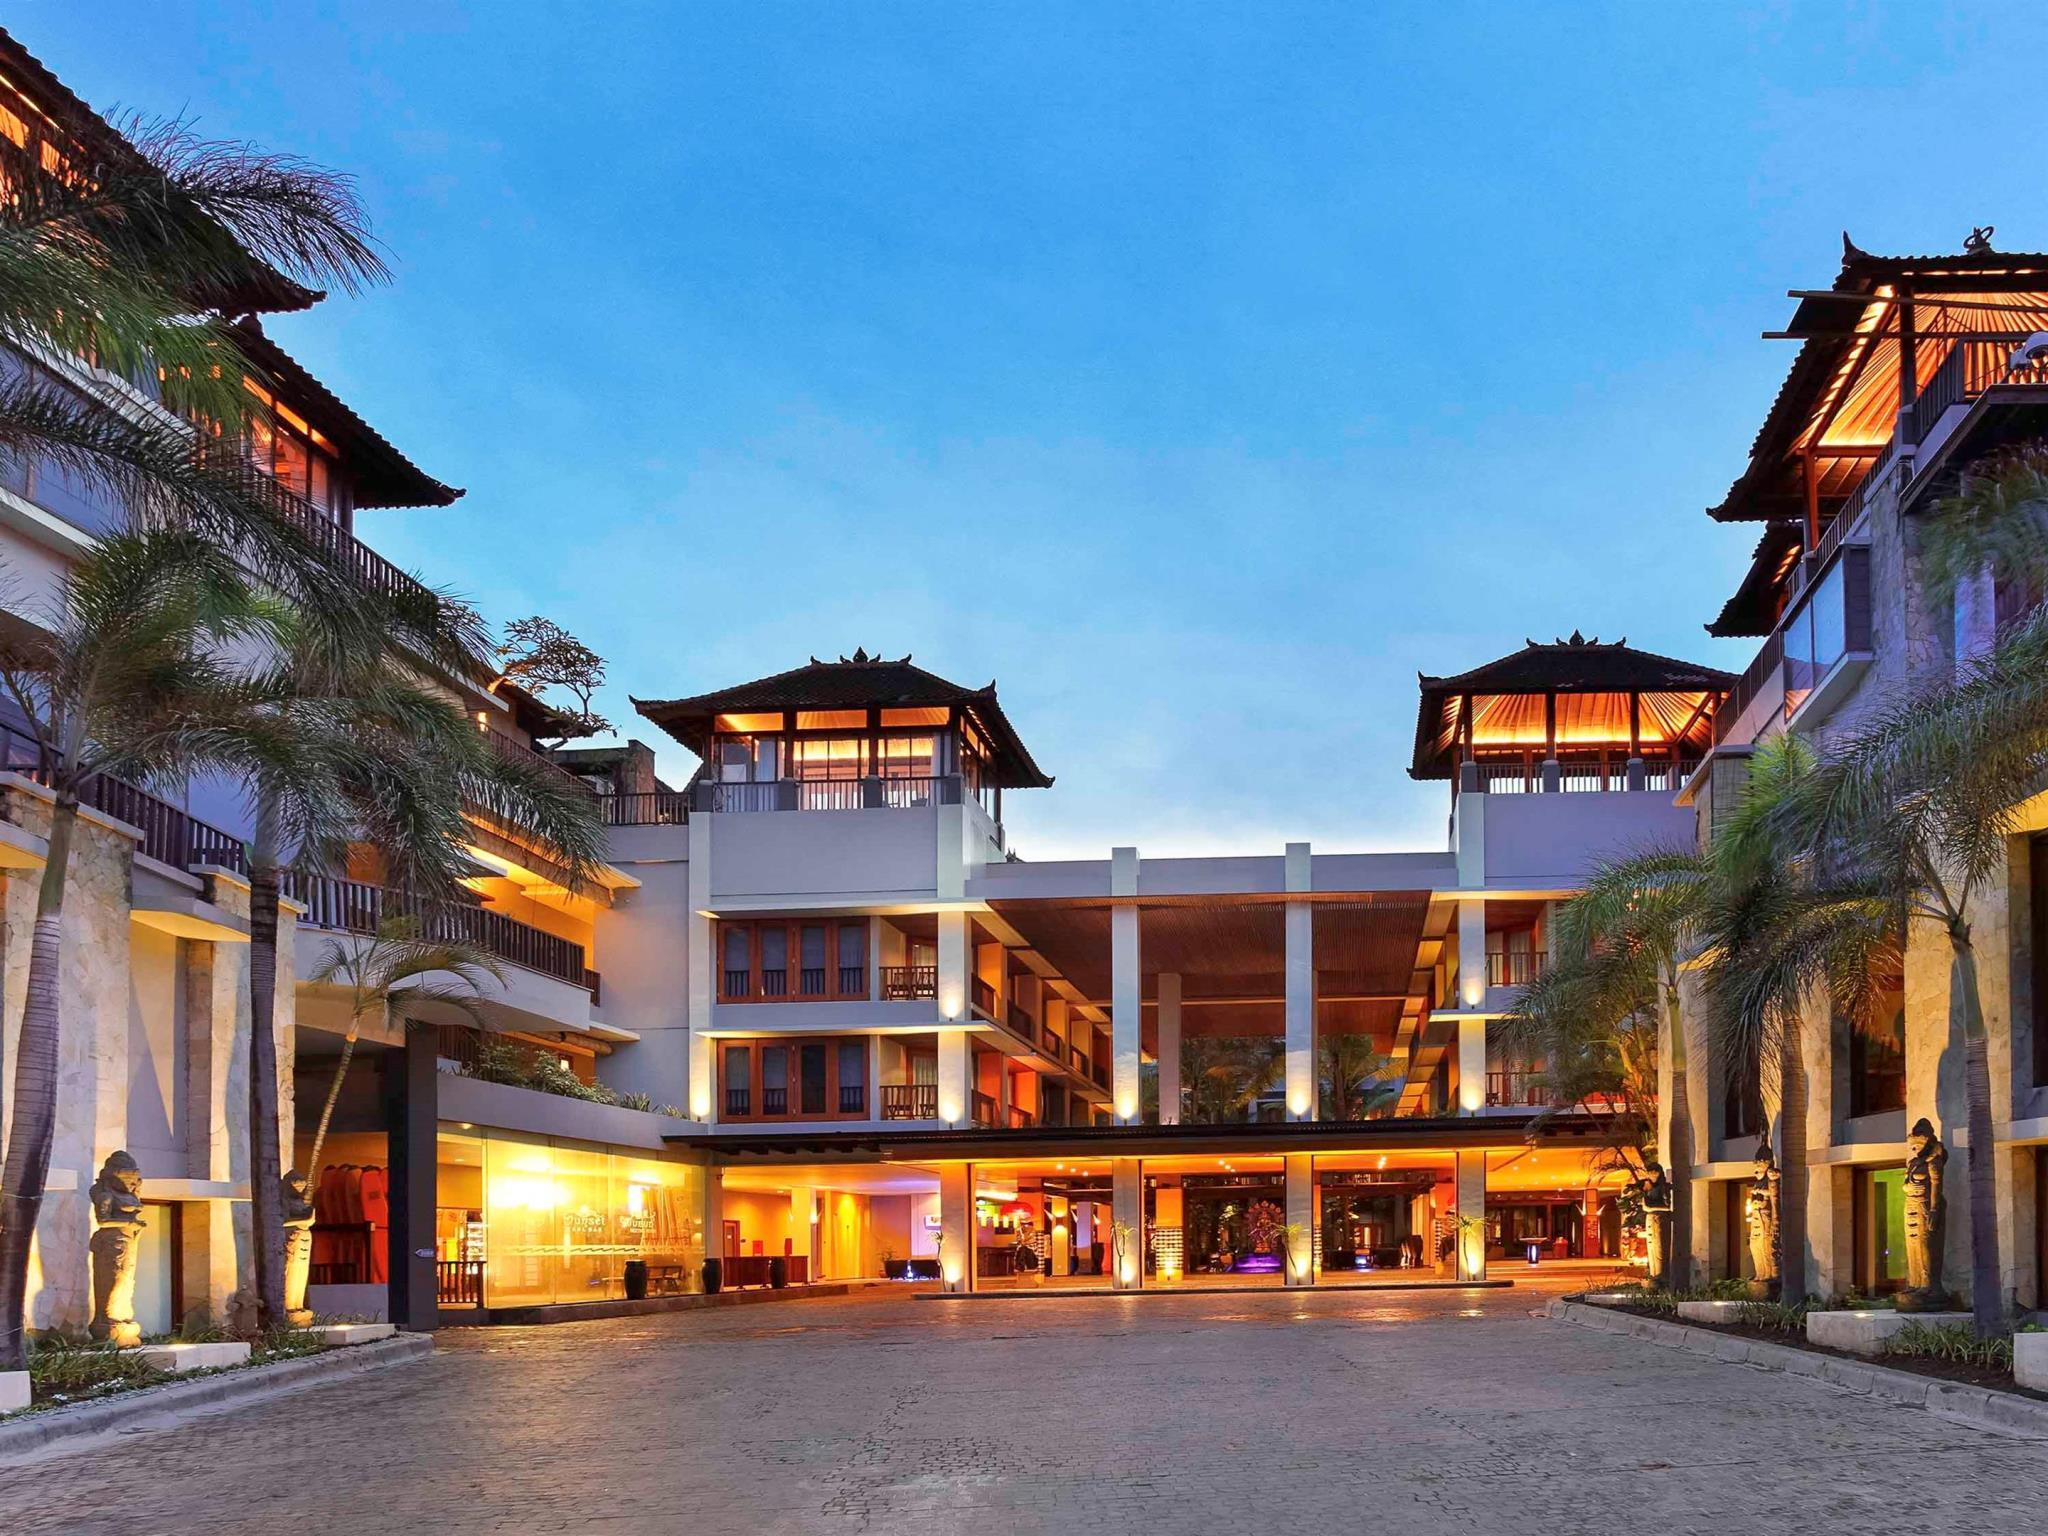 Aeroporto Bali : Mercure kuta bali bali oportunidades de última hora com agoda na